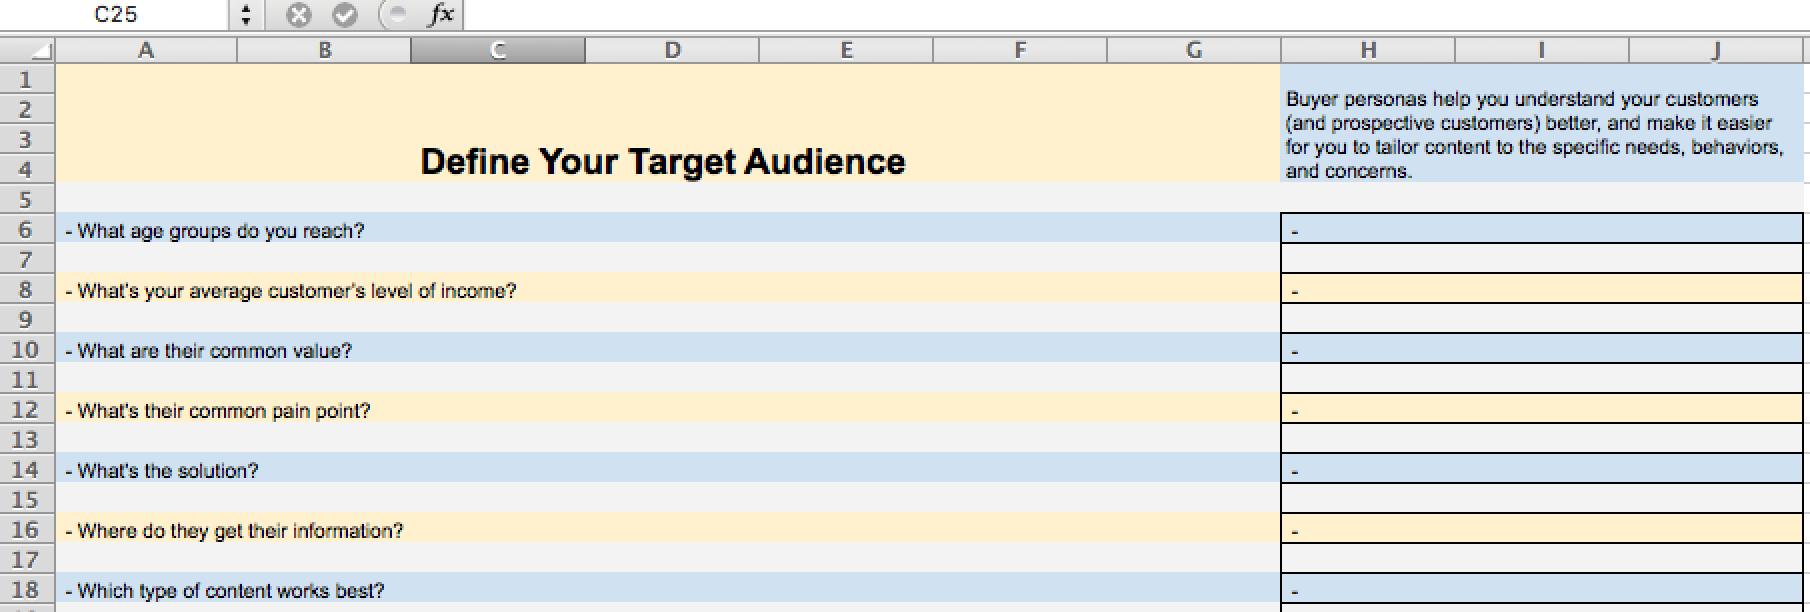 Target Audience img